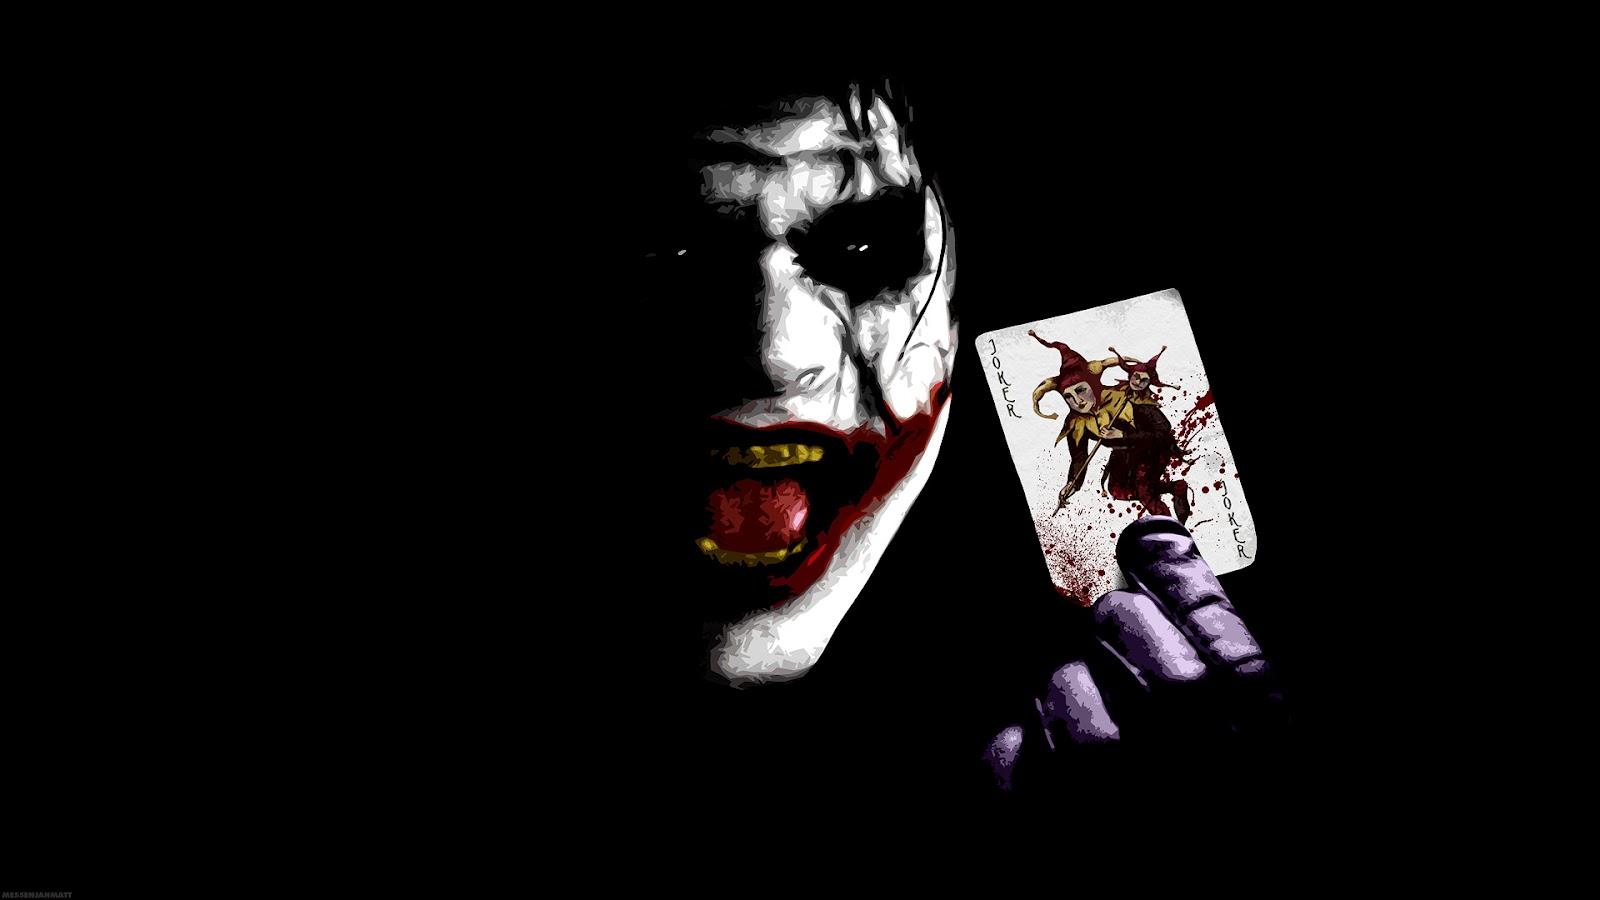 http://2.bp.blogspot.com/-ZaTPuvzrx3U/T-sQ85viRgI/AAAAAAAAAVU/VFqFd6wyDuY/s1600/Wallpaper+zombie.jpg